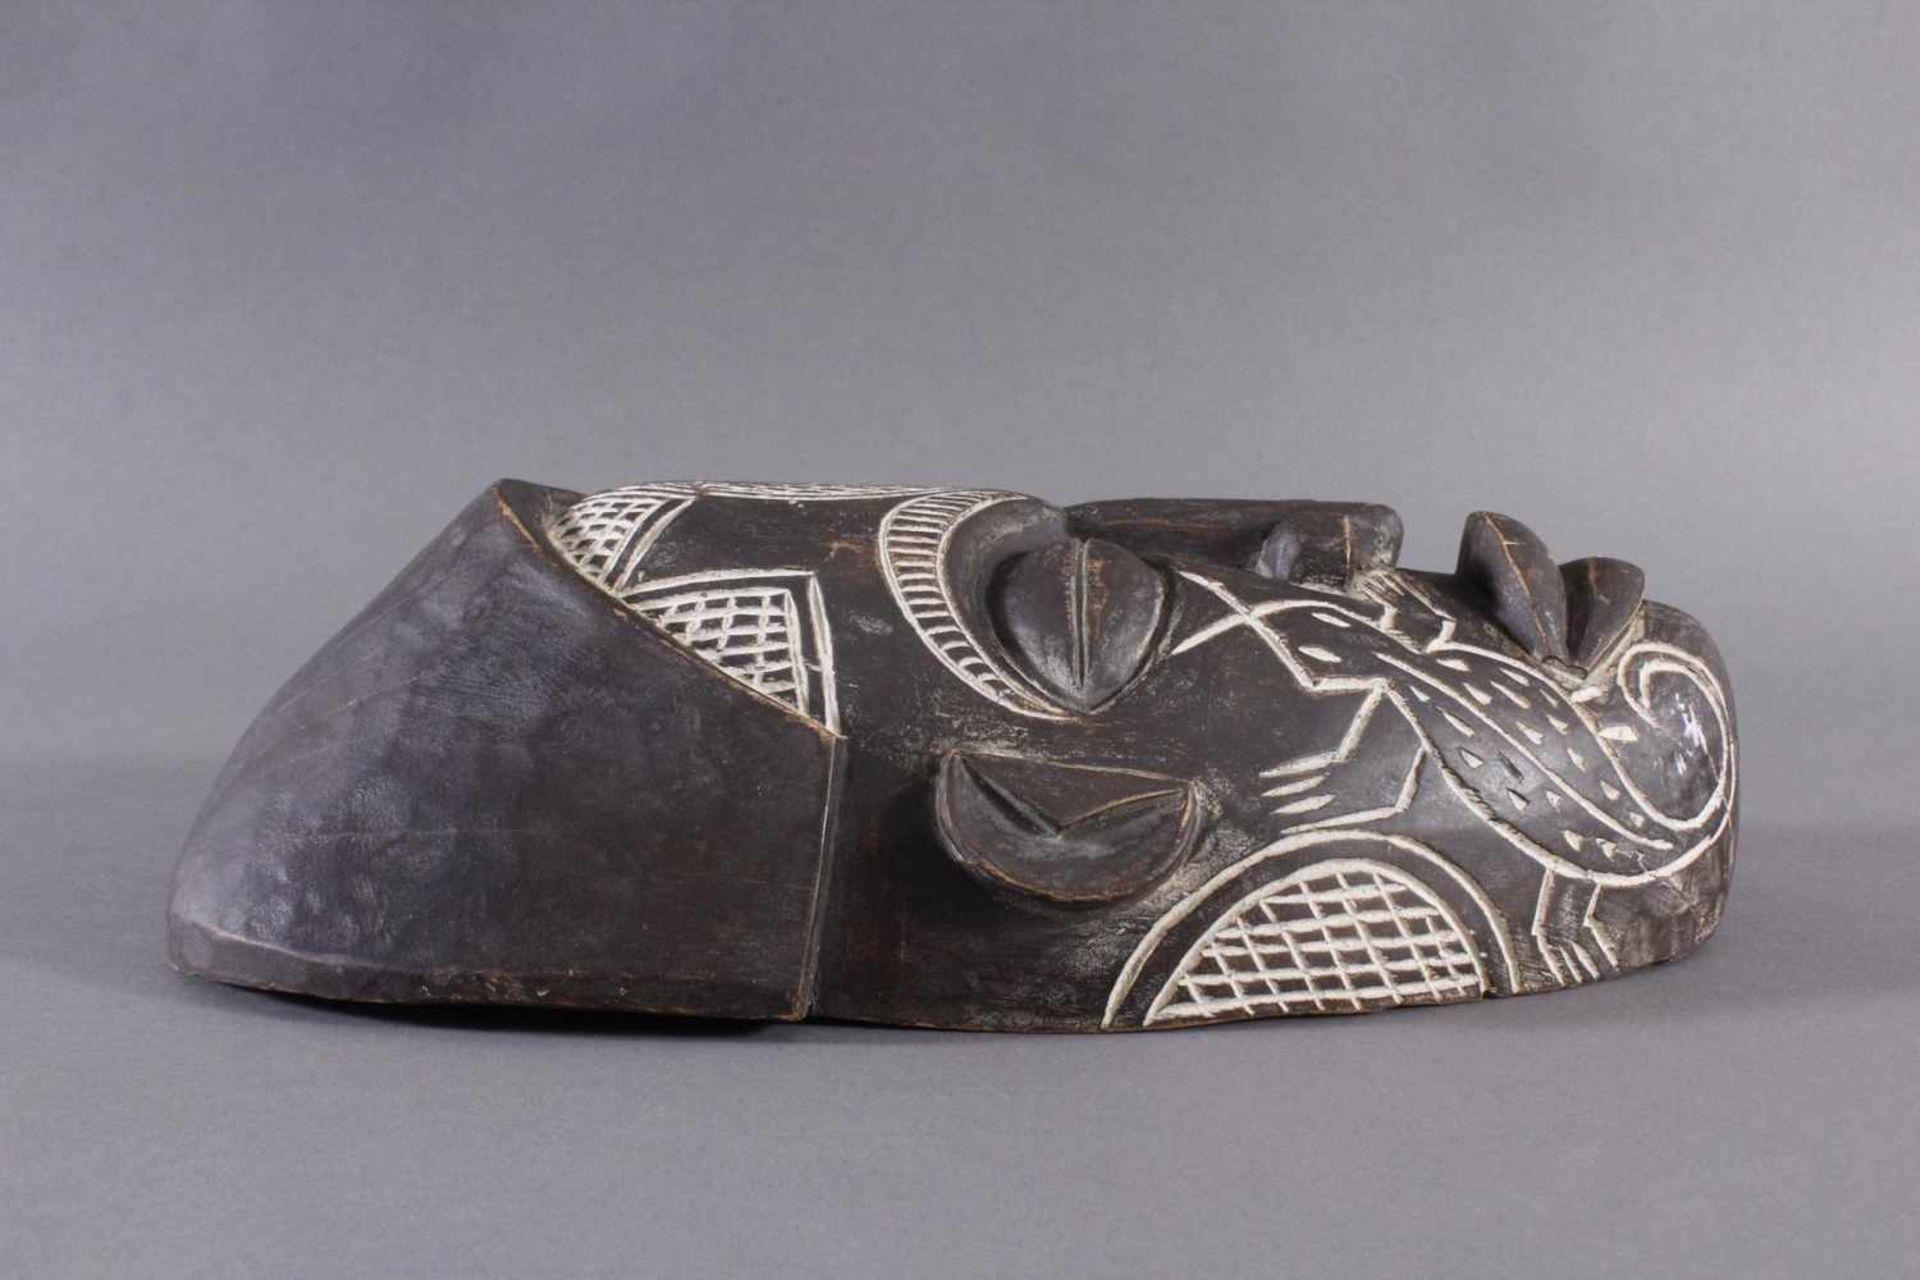 Antike Maske, Chokwe, Angola 1. Hälfte 20. Jh.Holz geschnitzt, dunkle Patina, Narbentatauierung, ca. - Bild 2 aus 7